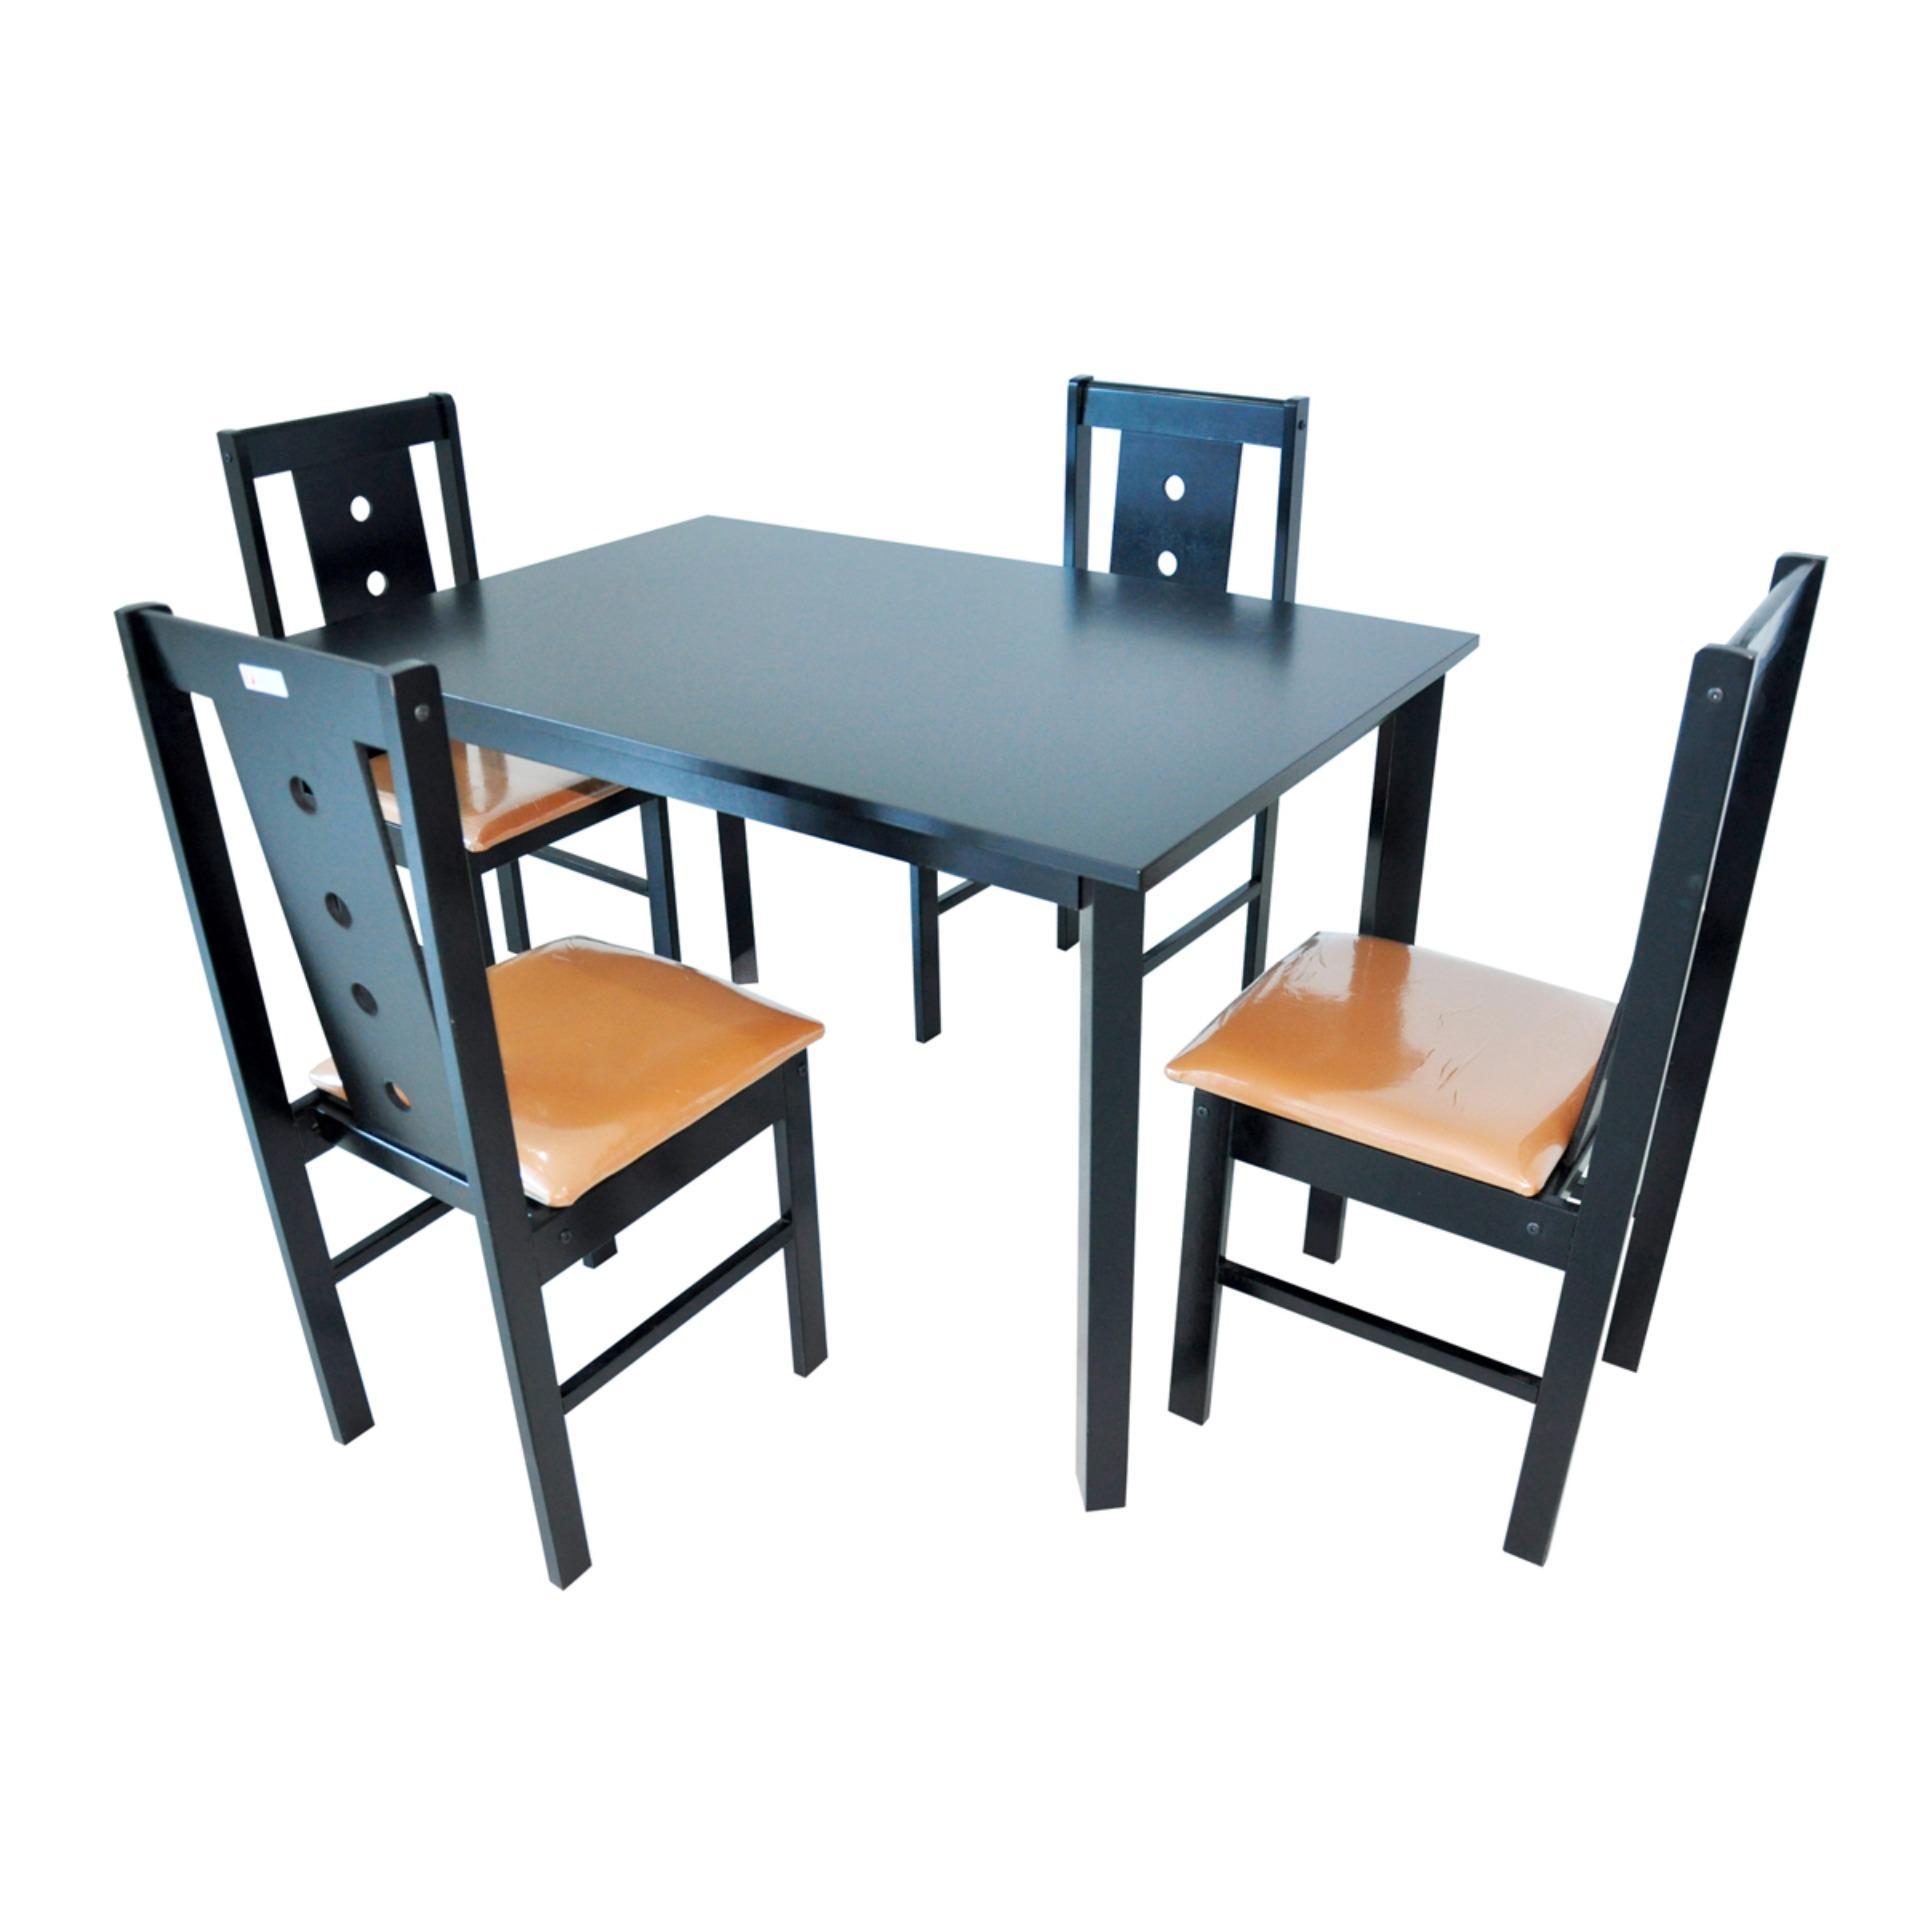 Felini Furniture Meja Makan 4 Kursi